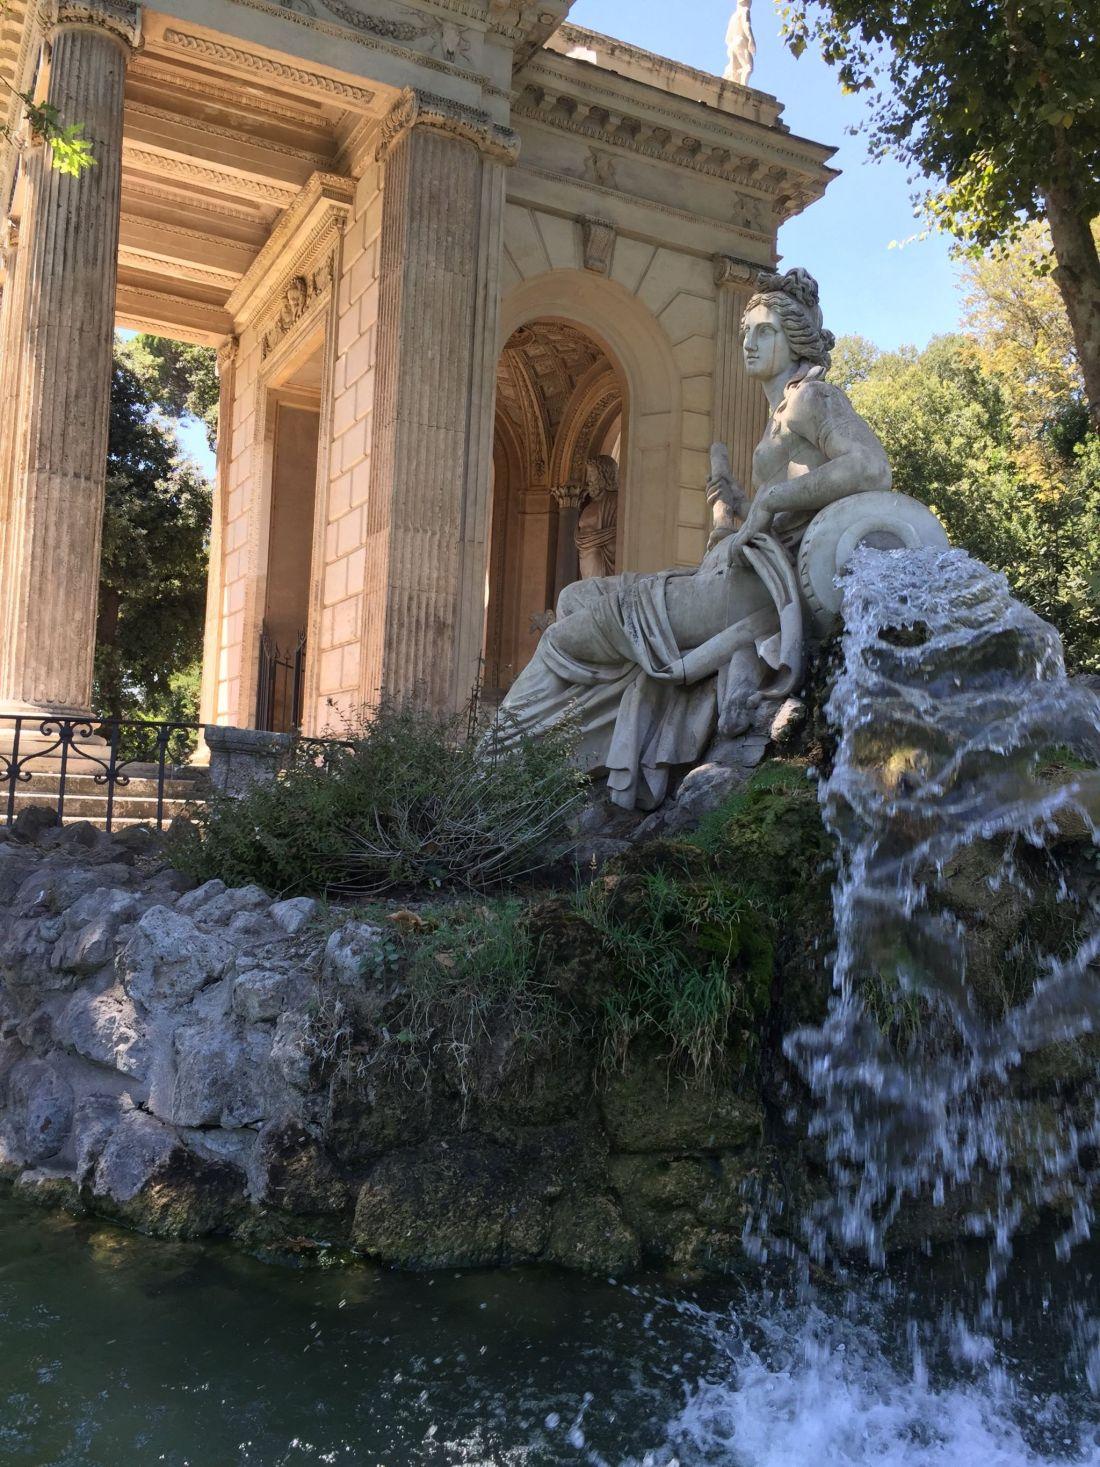 Statue on Villa Borghese Gardens lake